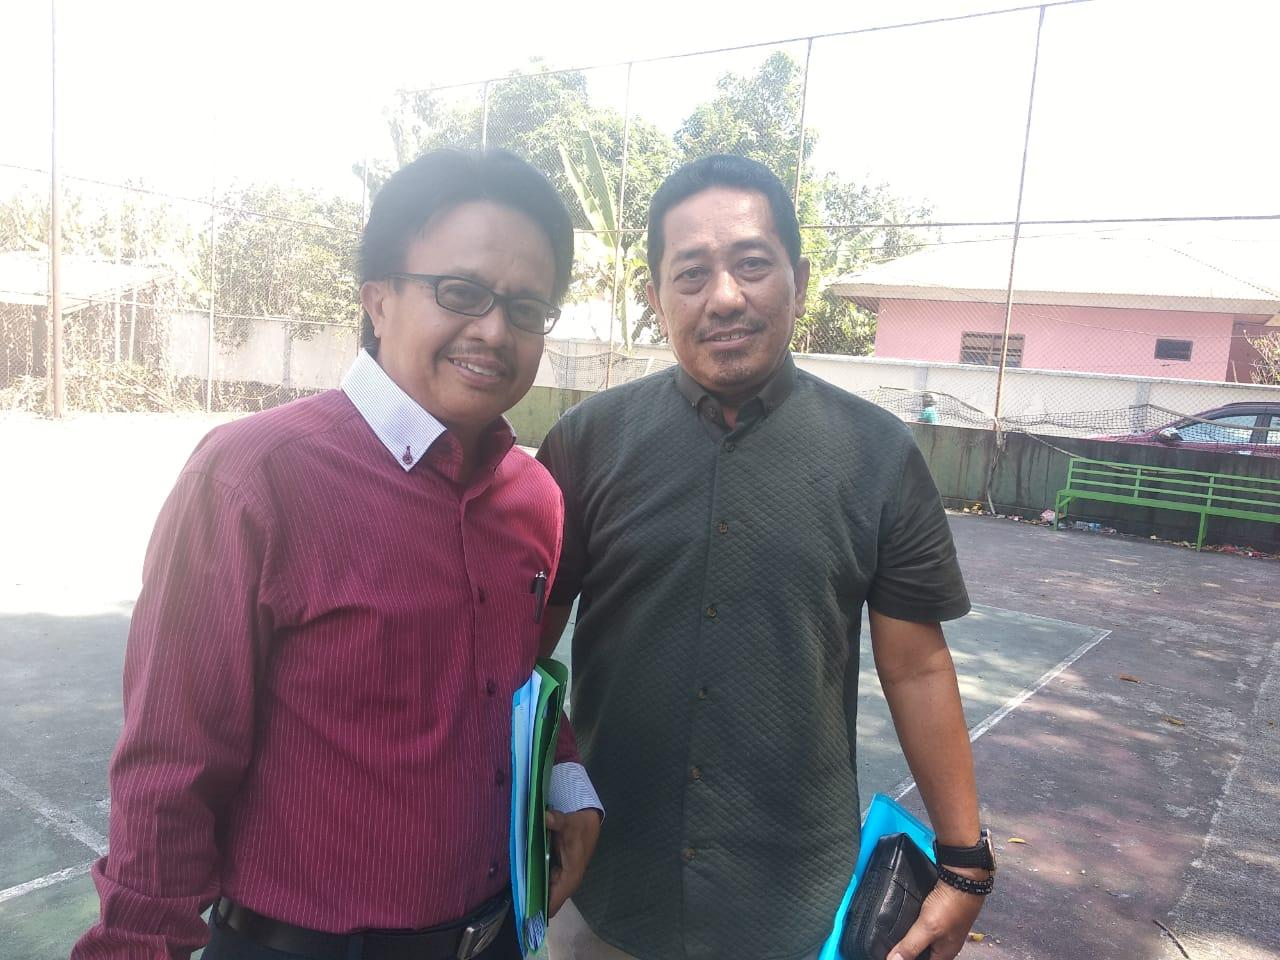 Sattar Dosen UMI Makassar Pimpin PELTI-PT LLDIKTI IX Sulawesi